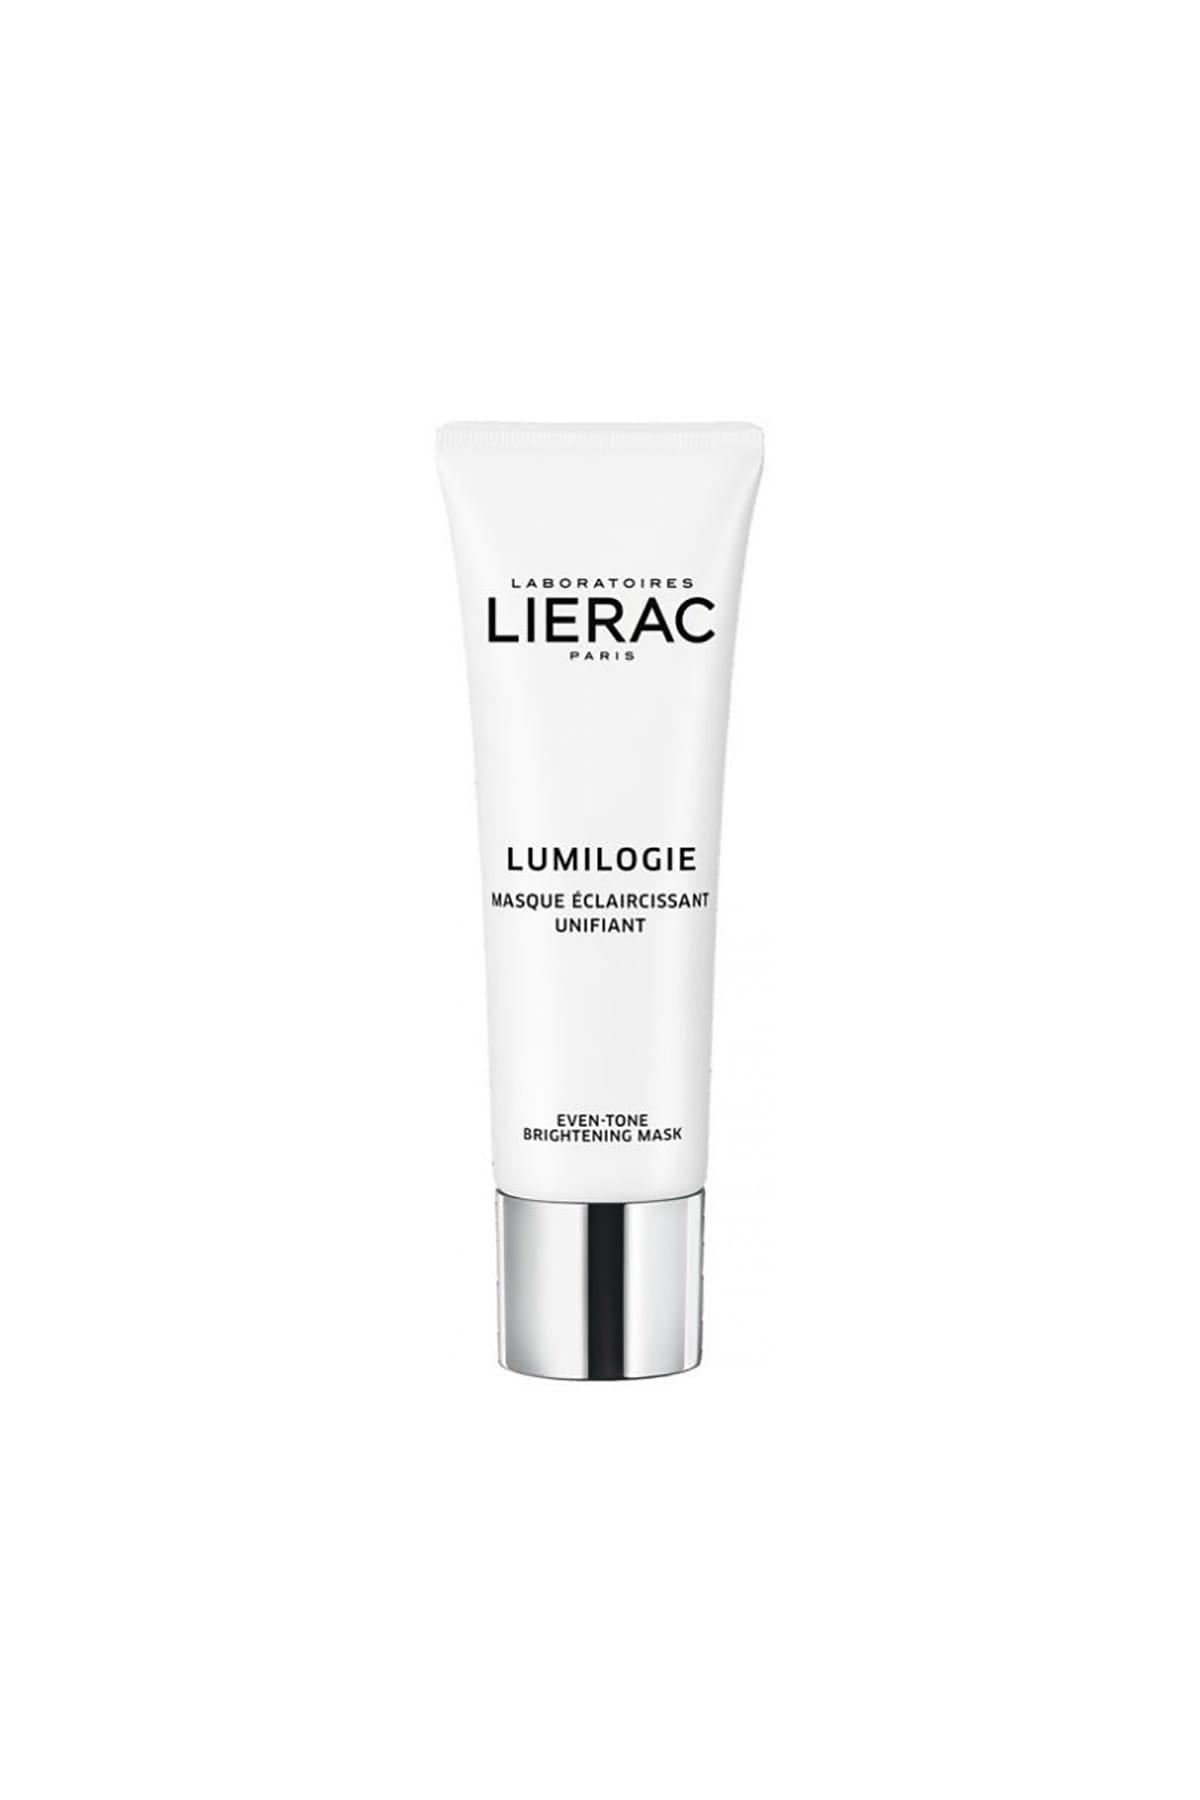 Lierac Lumilogie Even-Tone Brightening Mask 50 ml 3508240003937 1